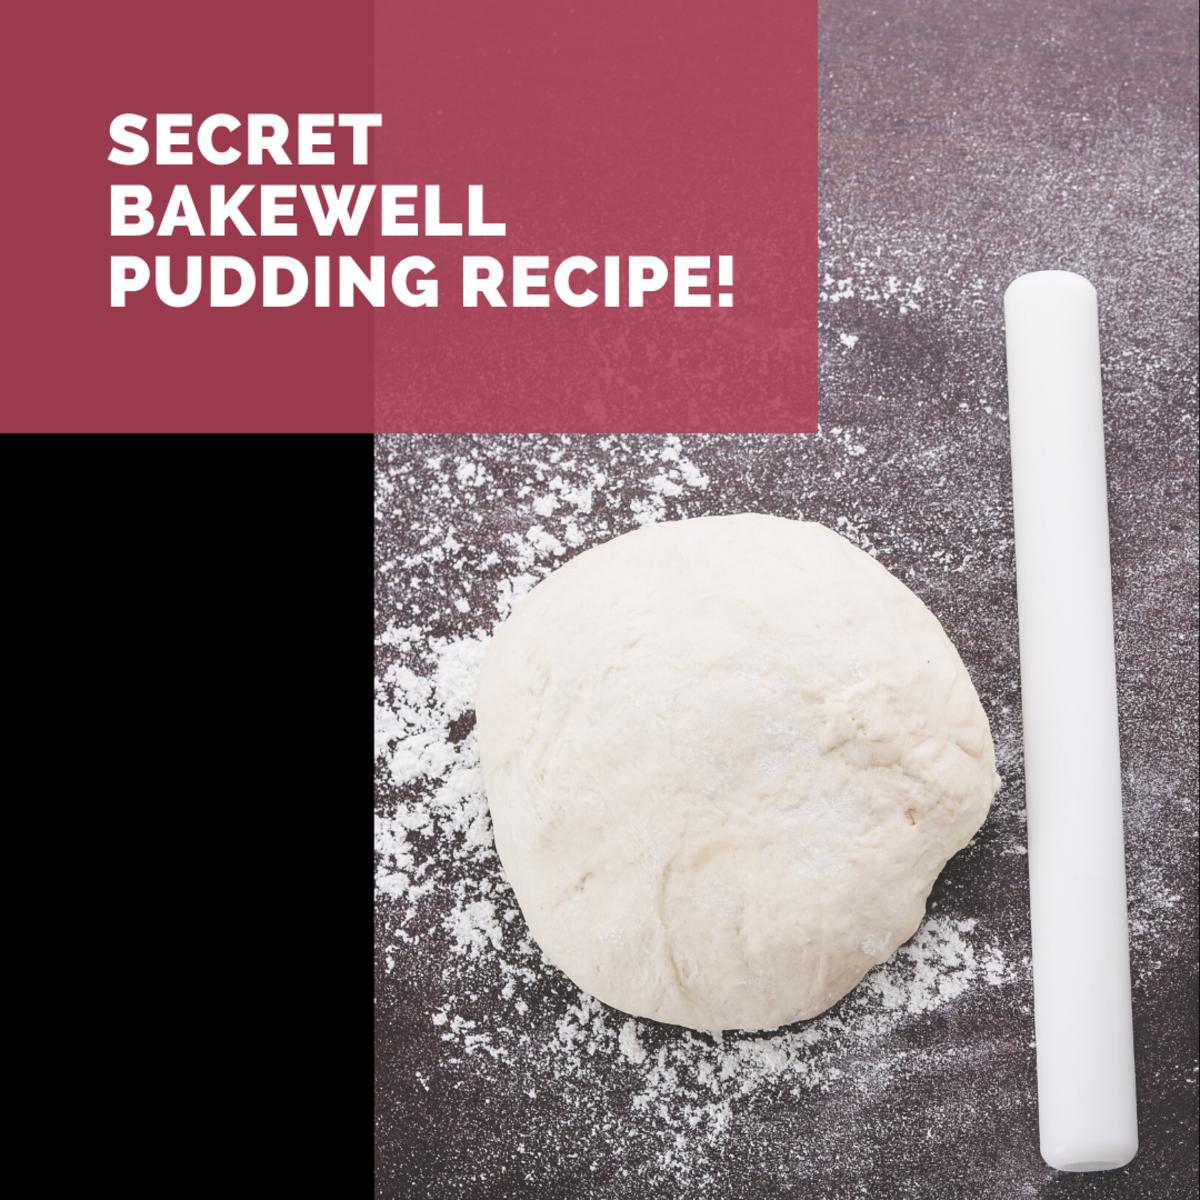 Step by Step 'Original' Secret Bakewell Pudding Recipe